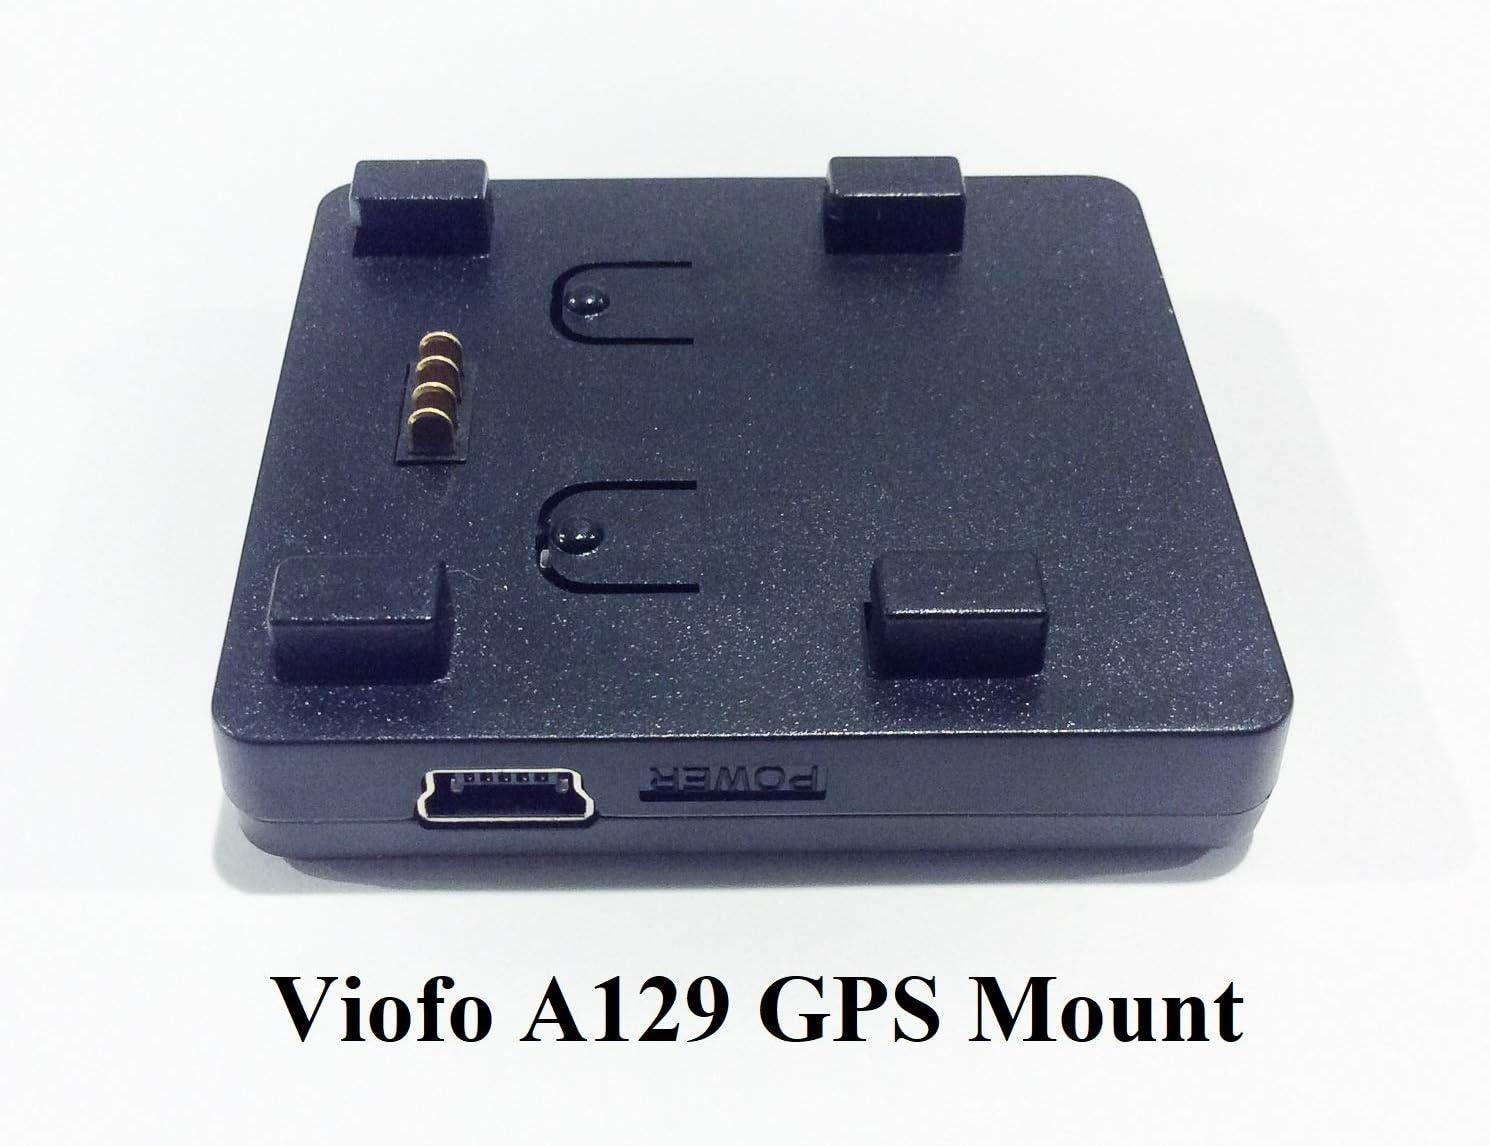 Viofo GPS Mount for The A129 Series Dash Cameras